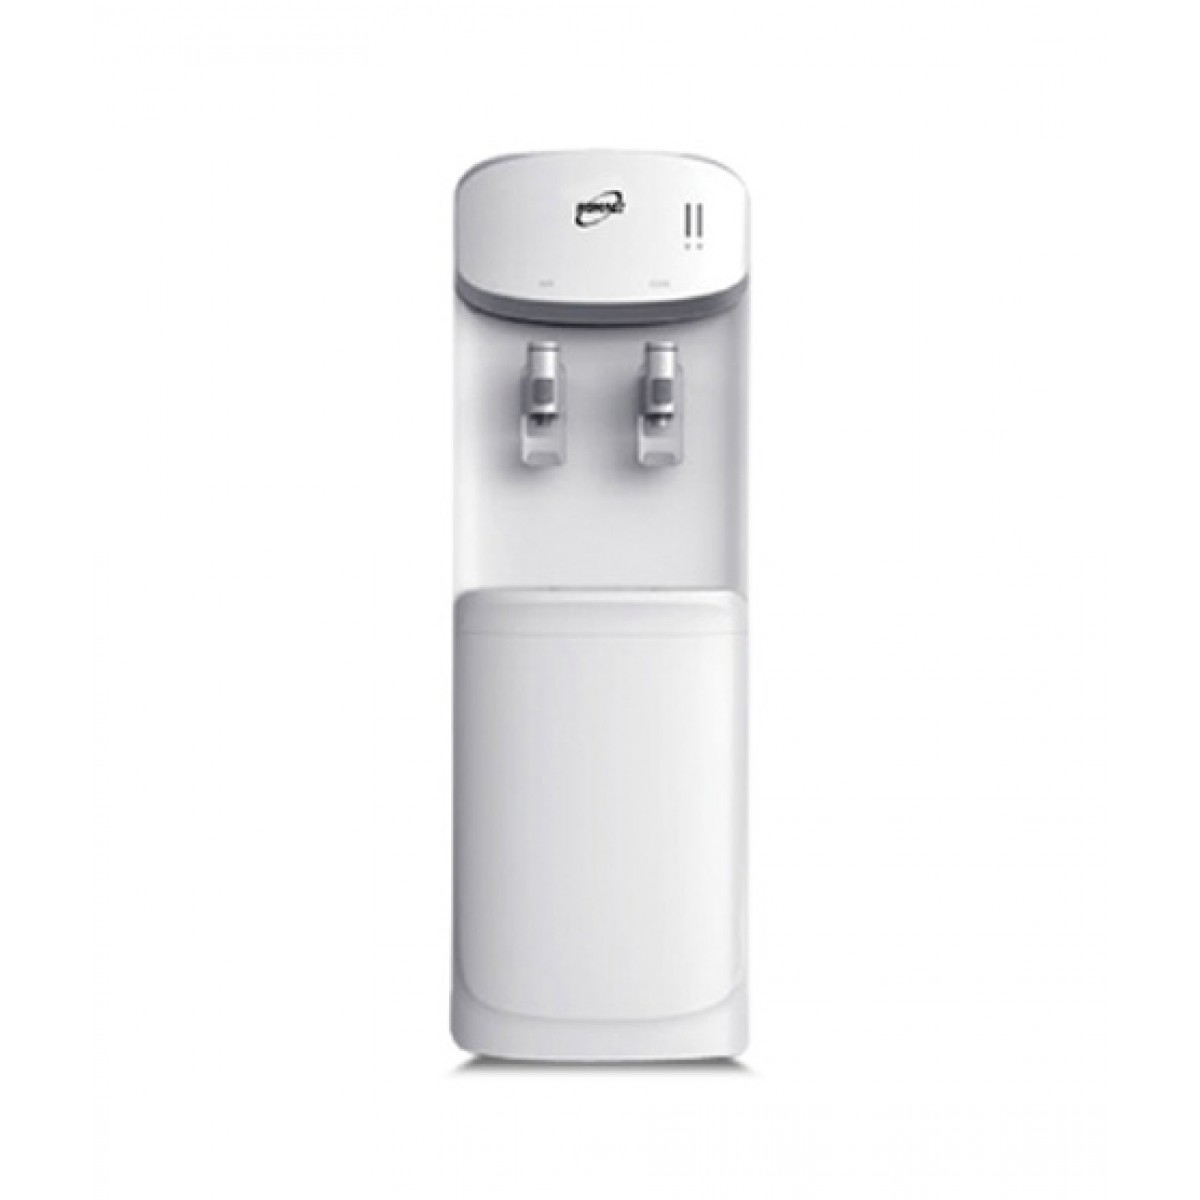 Homage 2 Taps Water Dispenser (HWD-25)